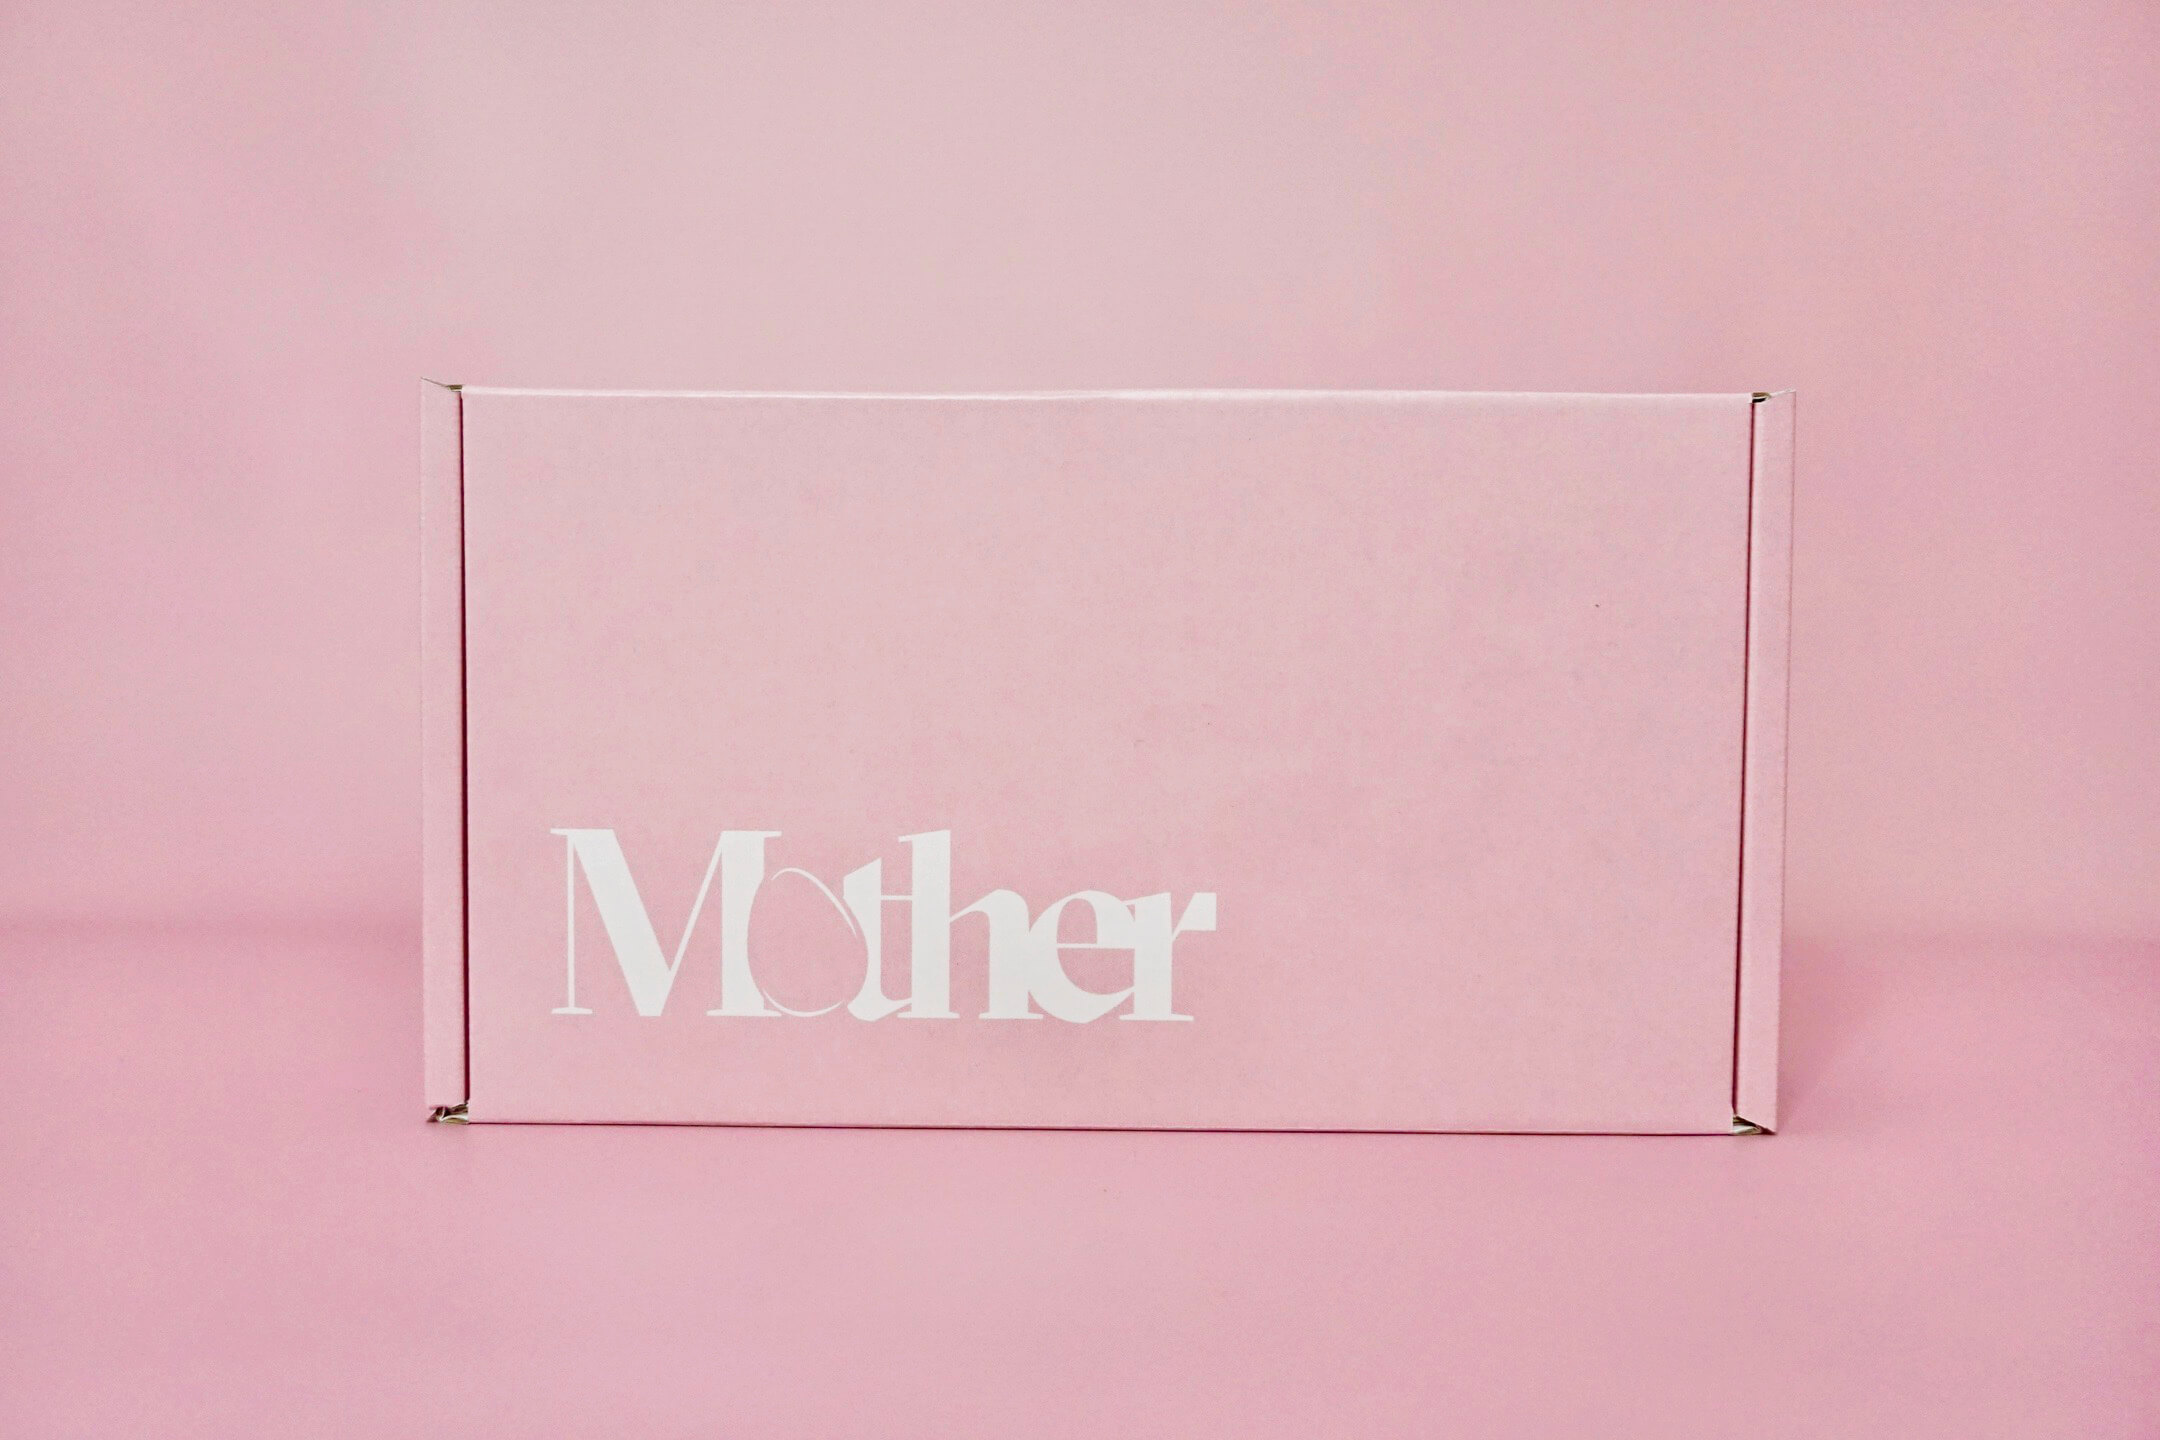 caja para envíos de color rosa